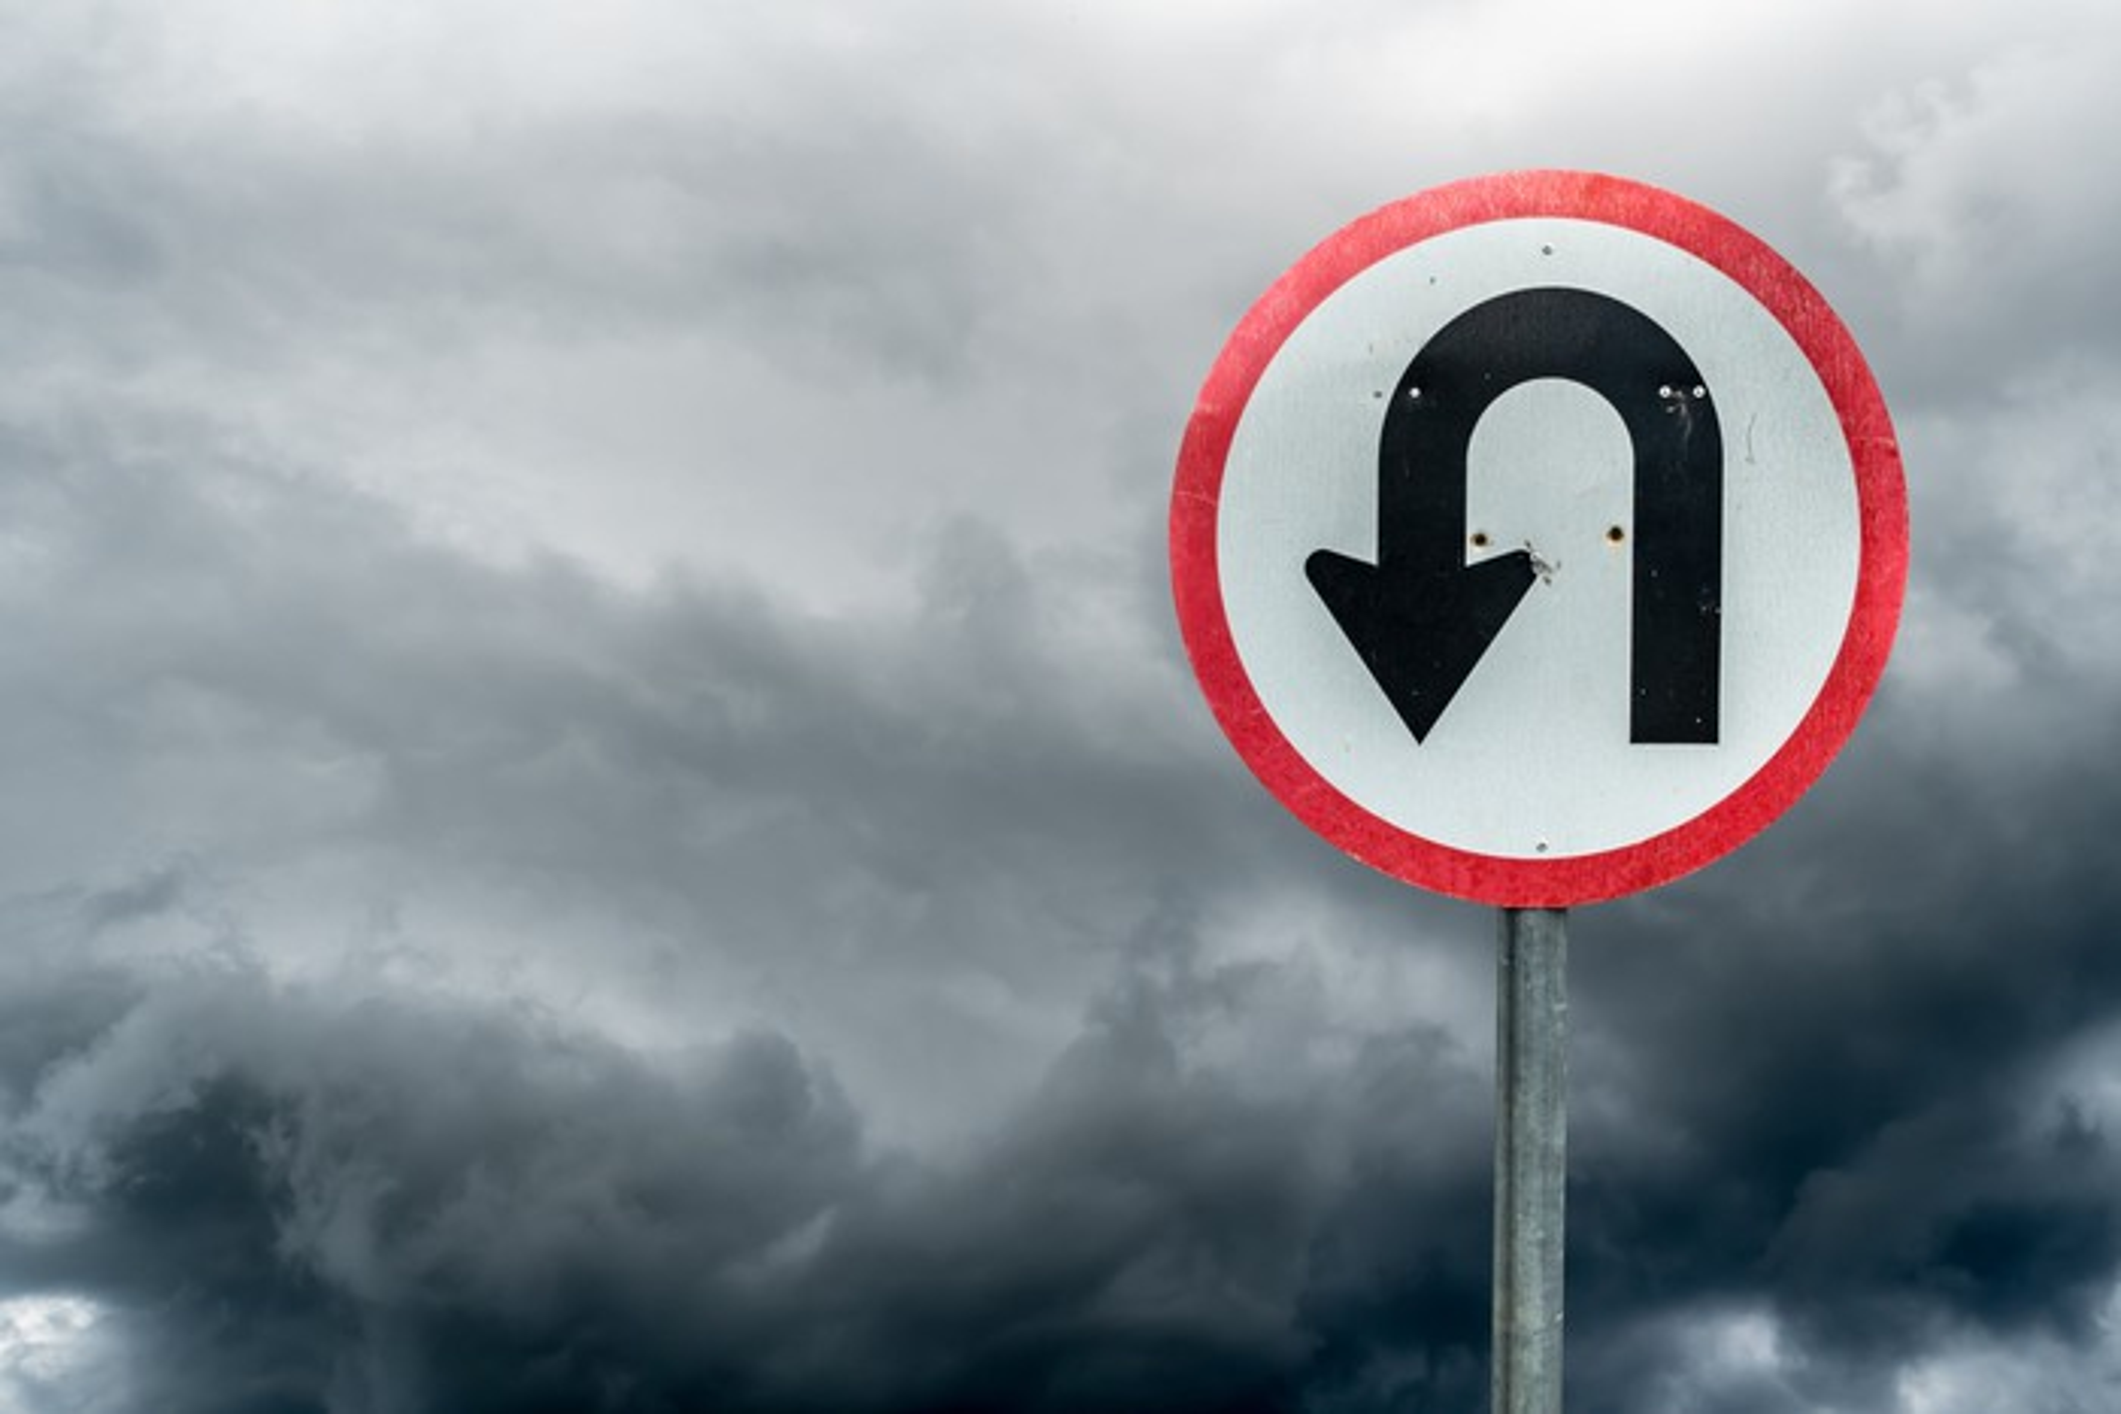 U-turn sign against a cloudy backdrop